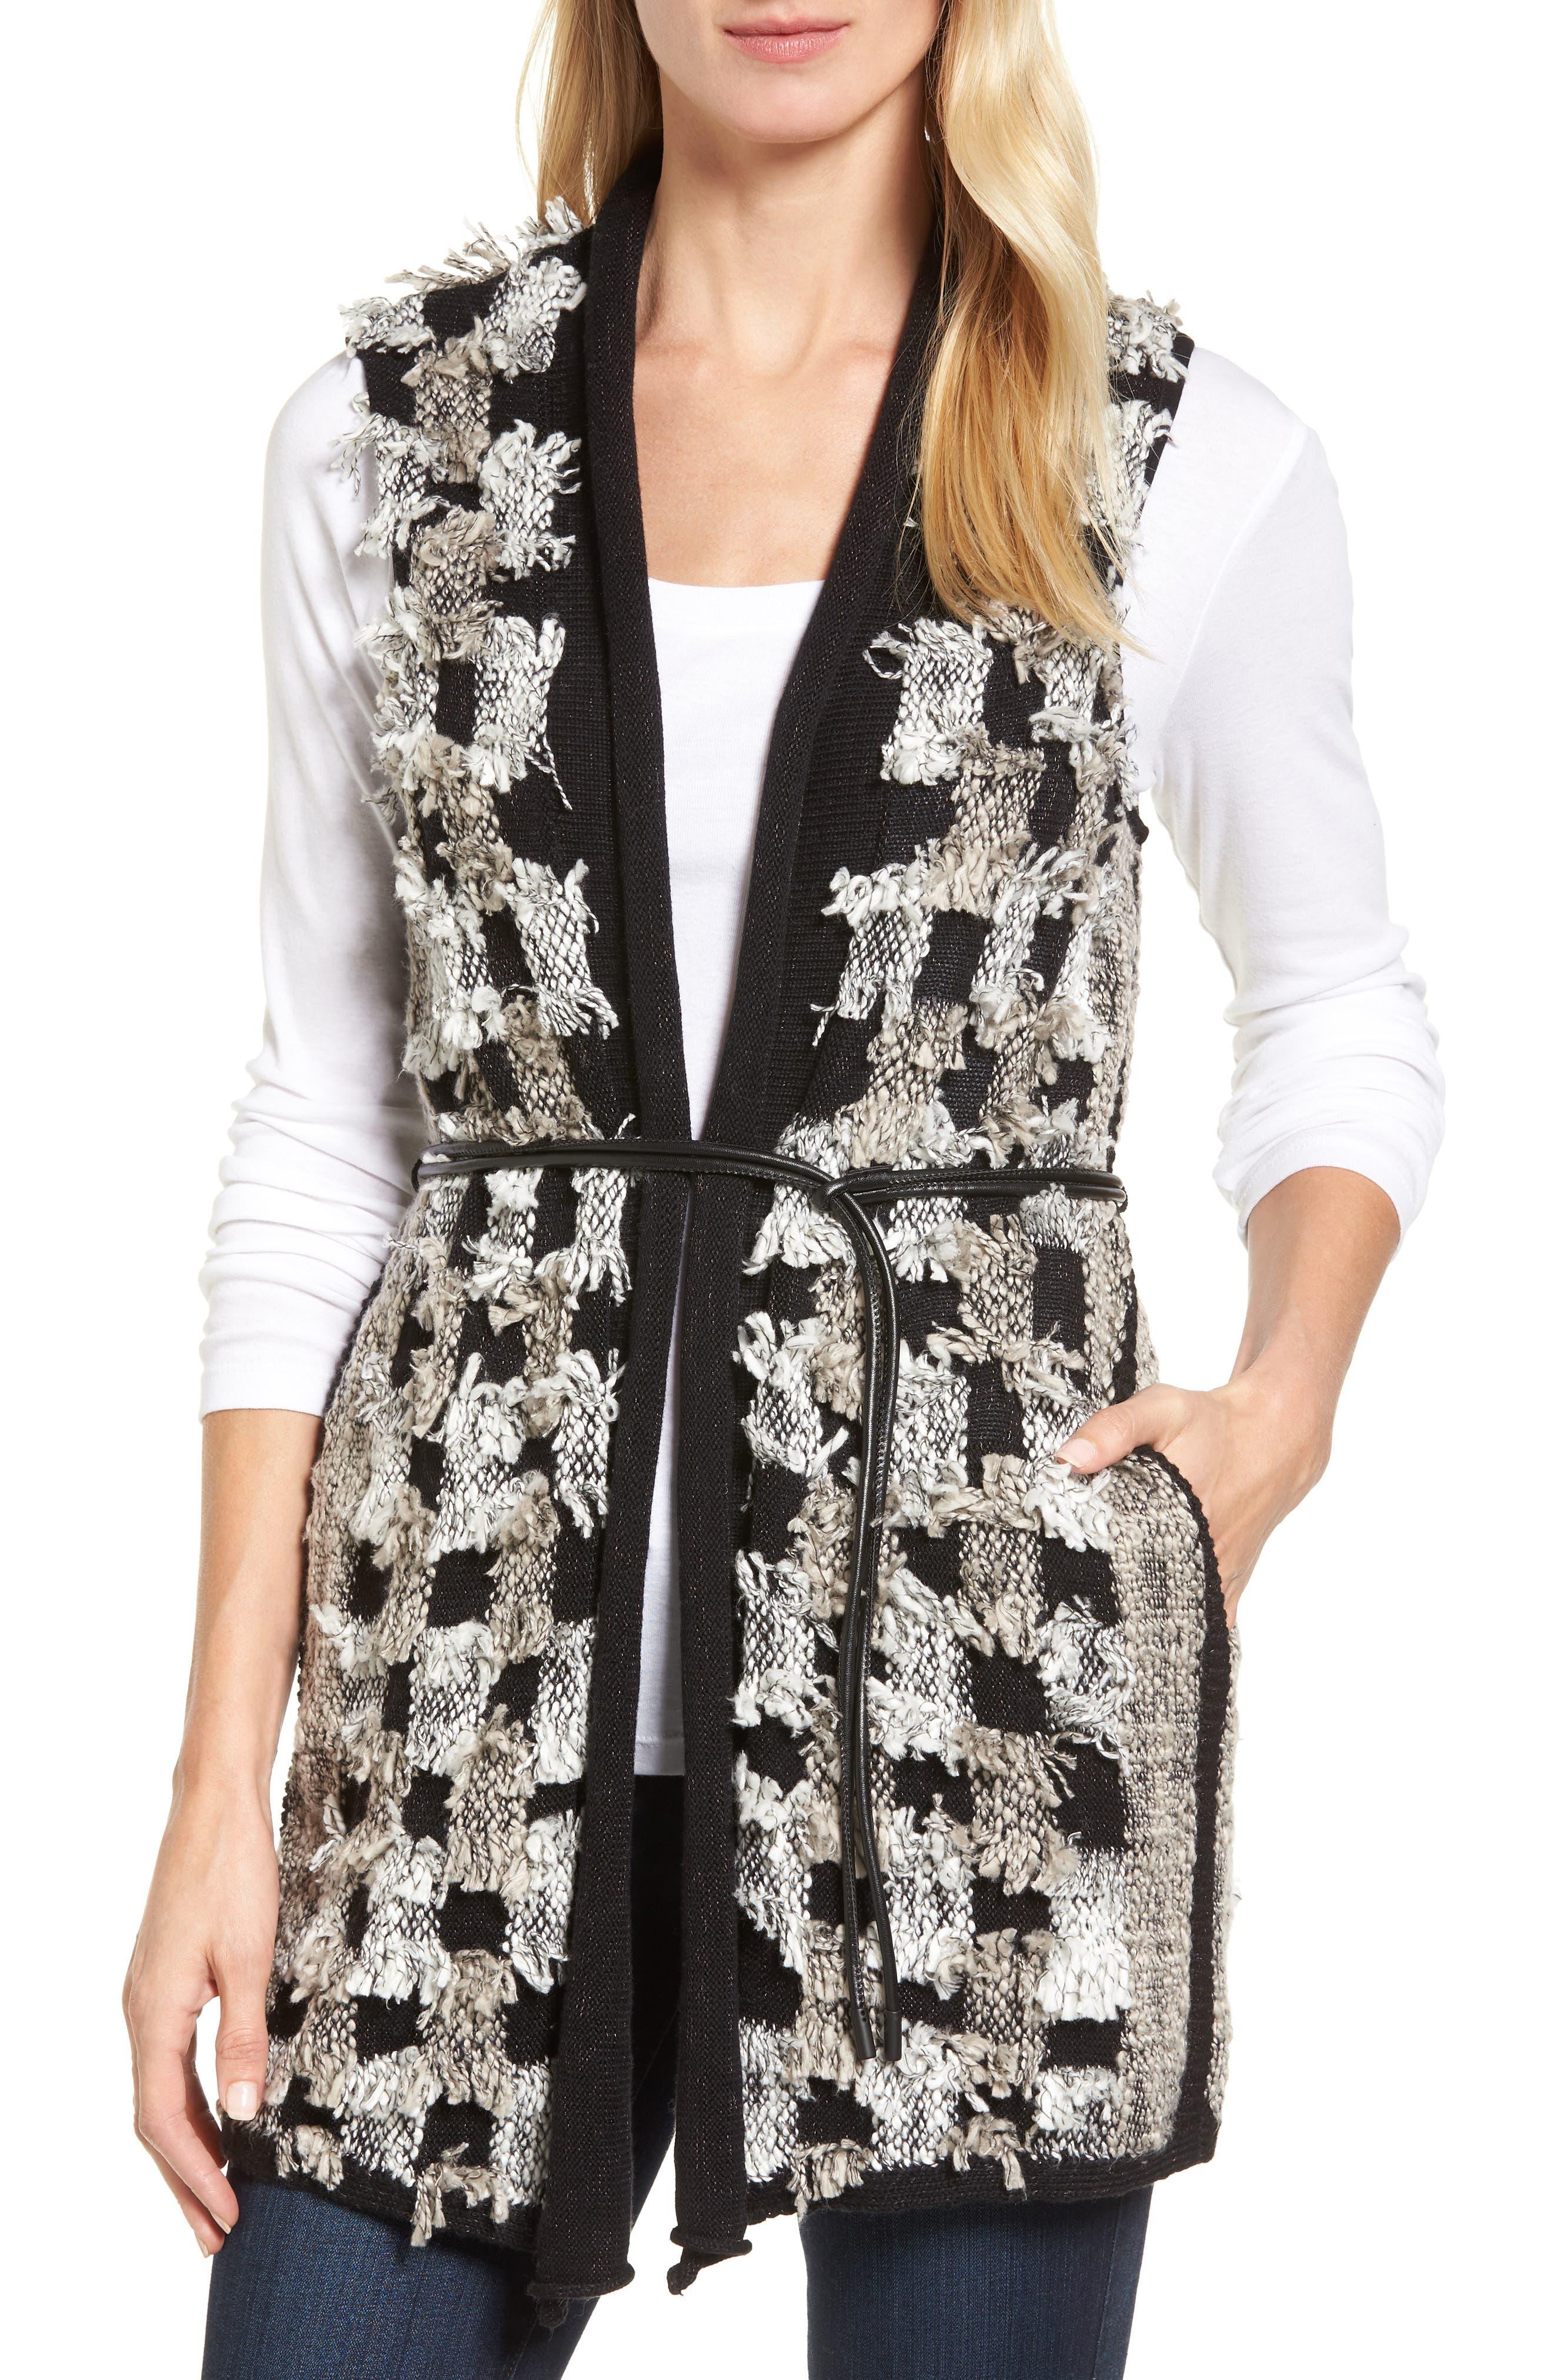 Alternate Image 1 Selected - NIC+ZOE Blocked Out Vest (Regular & Petite)